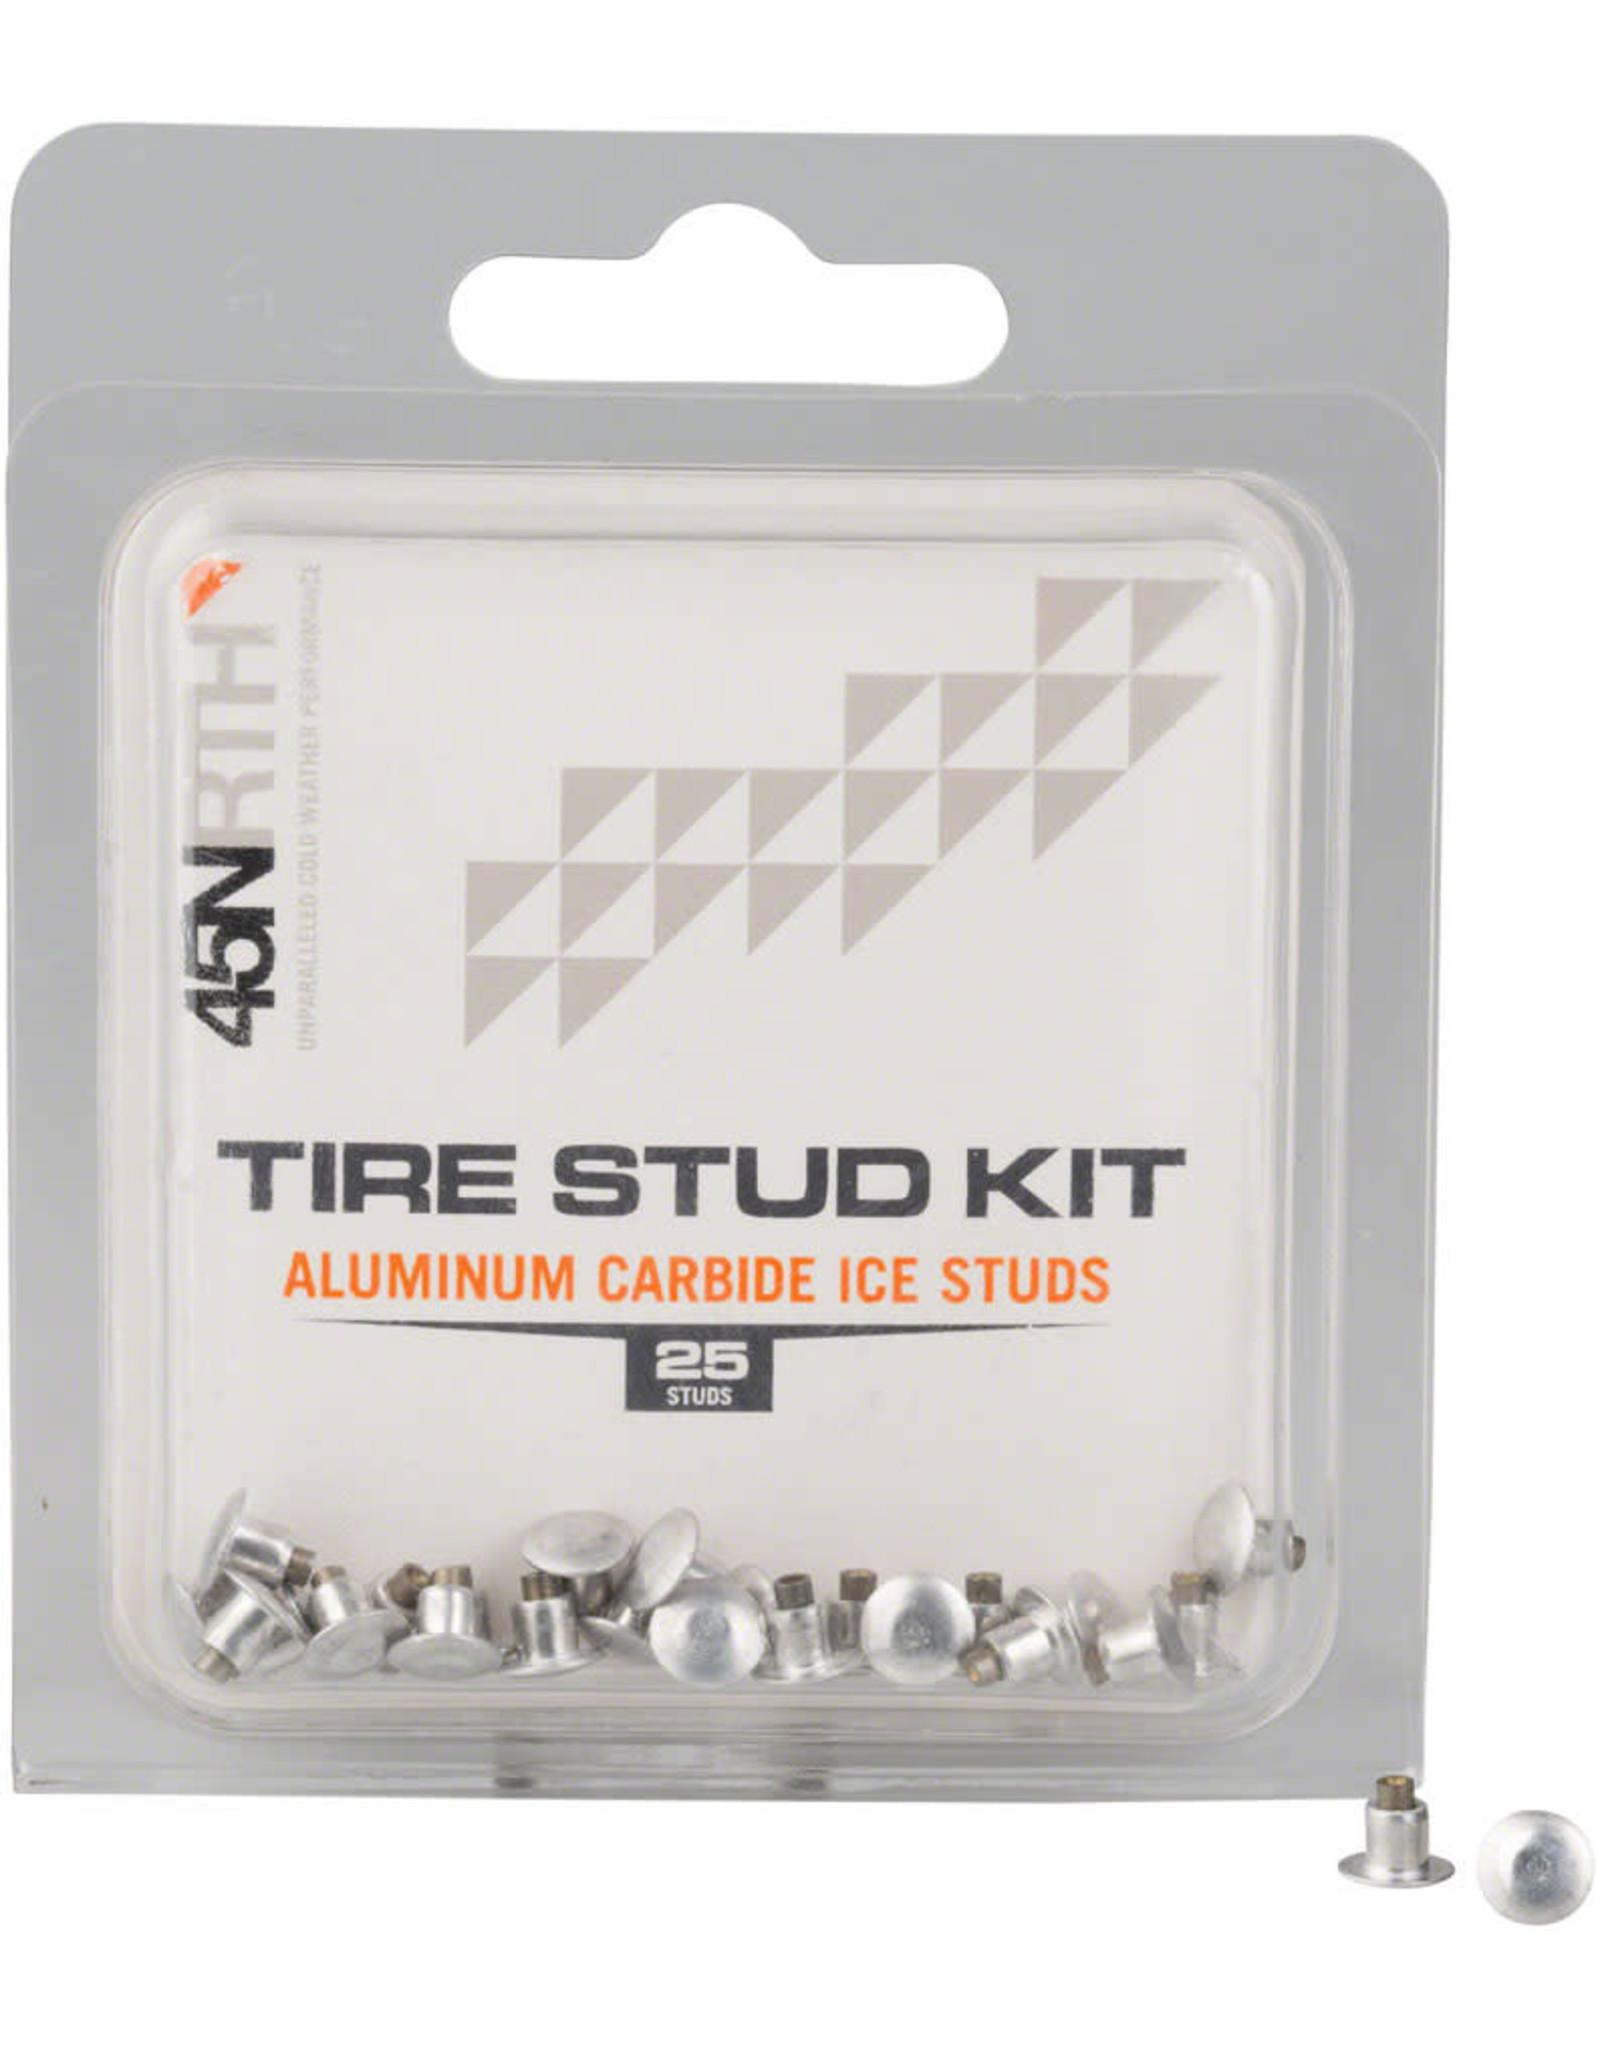 45NRTH 45NRTH XL Concave Studs: Aluminum Carbide, Pack of 25